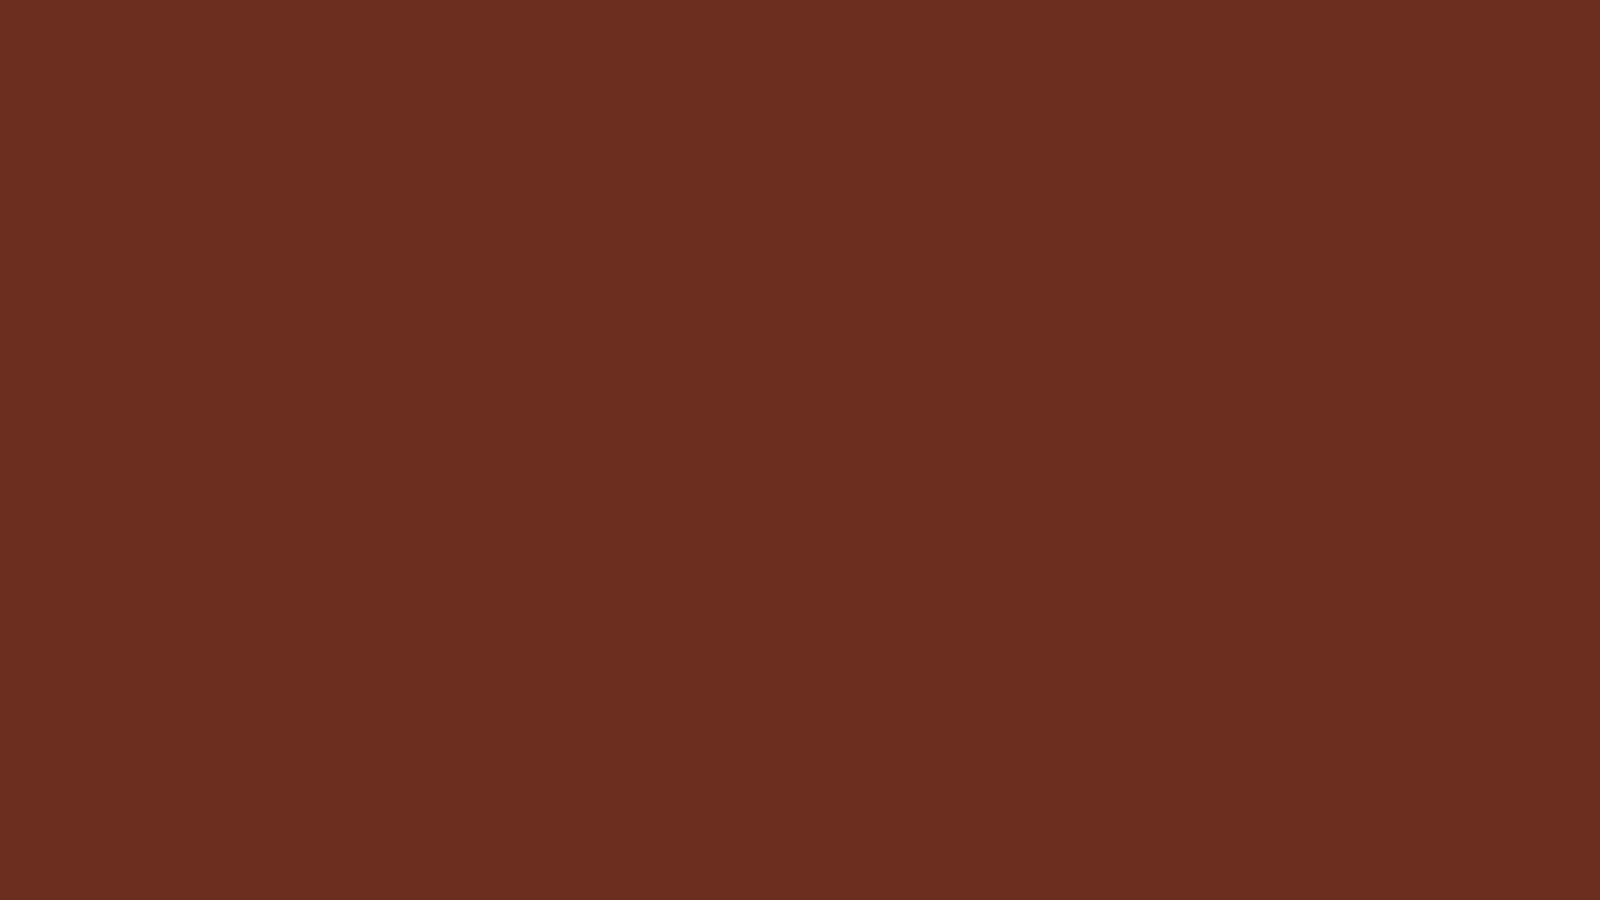 1600x900 Liver Organ Solid Color Background